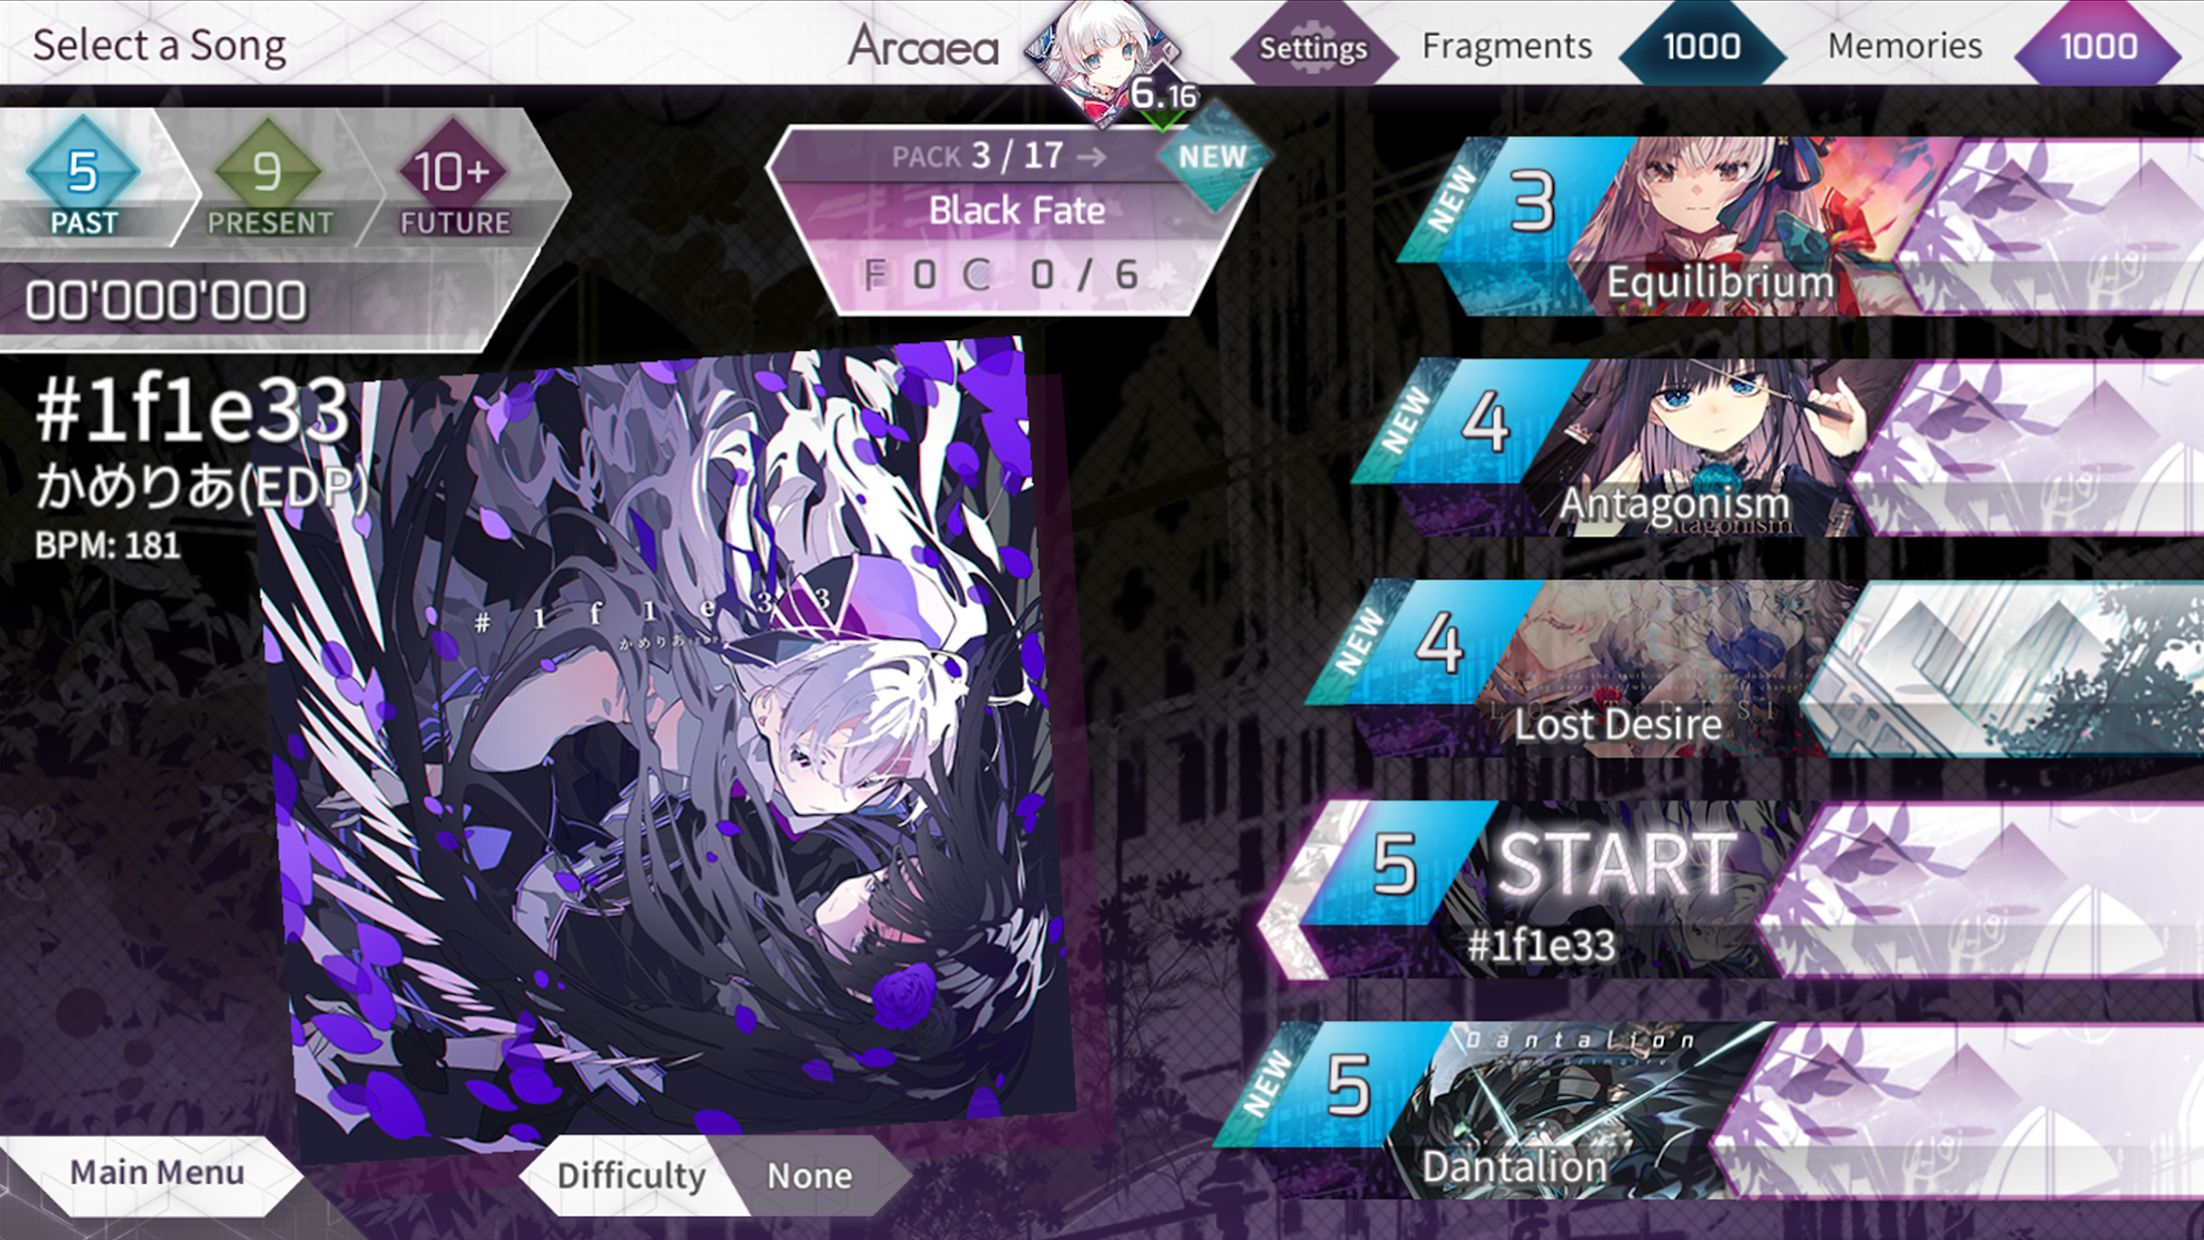 Arcaea – 创新立体节奏游戏 游戏截图2